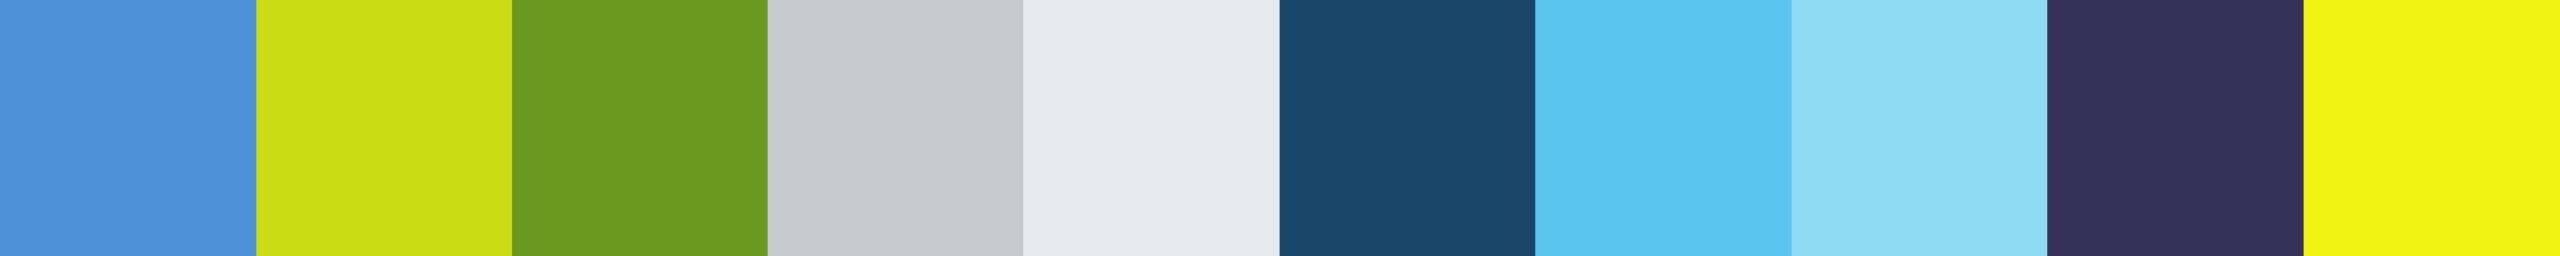 431 Ocrania Color Palette